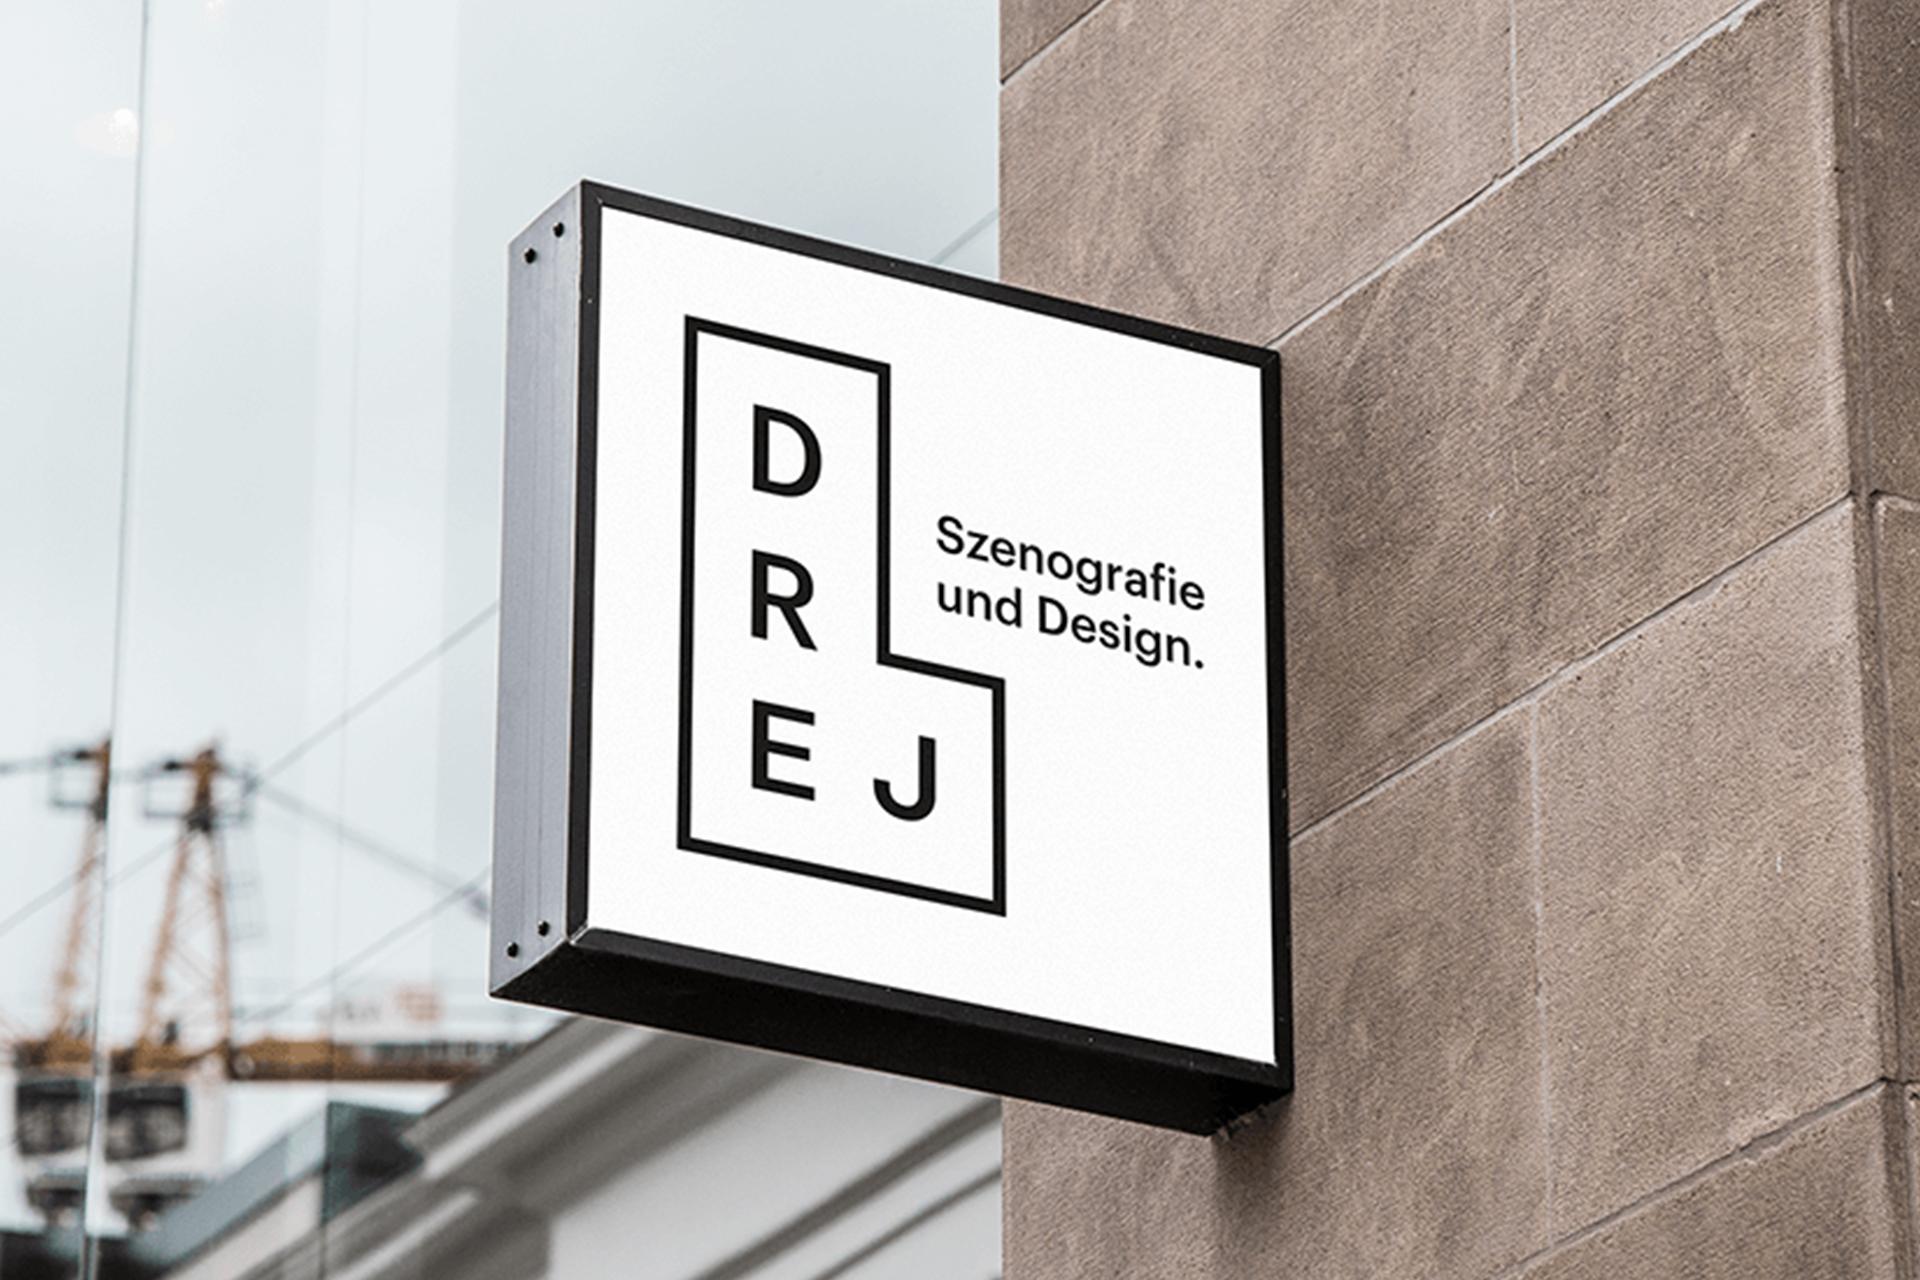 marco-stoermer-vitae-drej-02